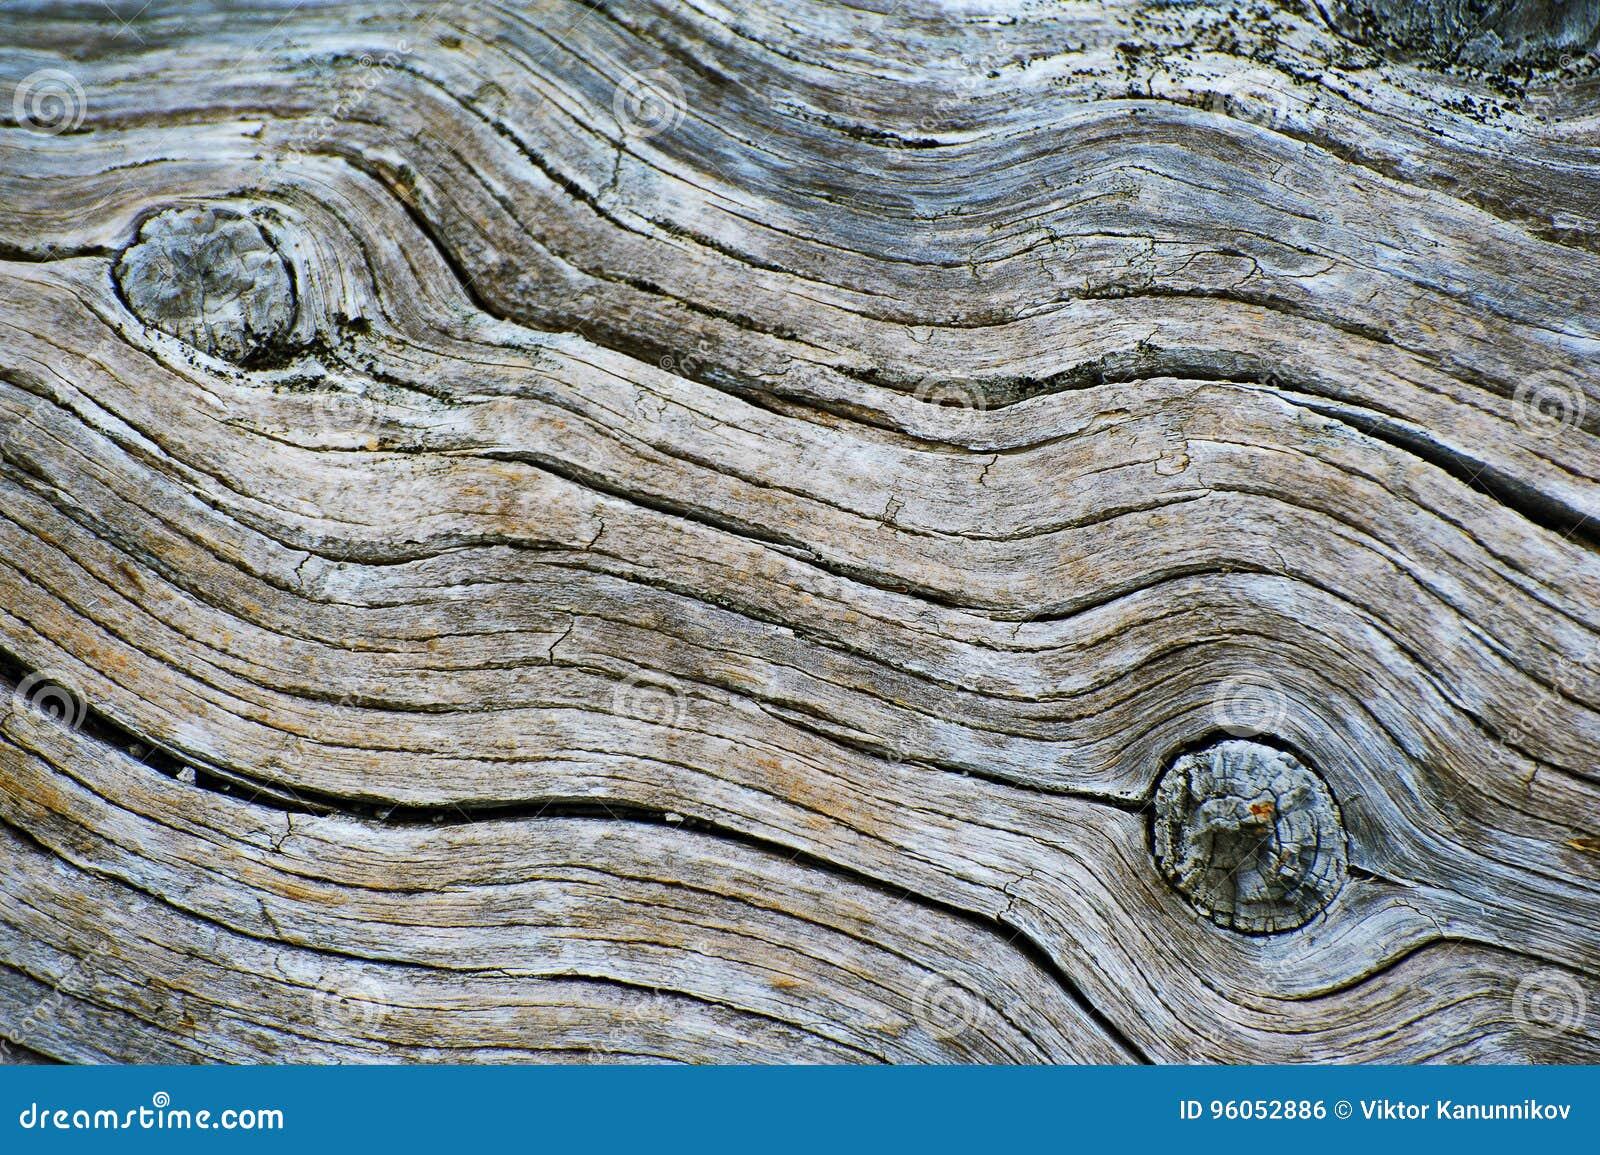 Vieille texture en bois